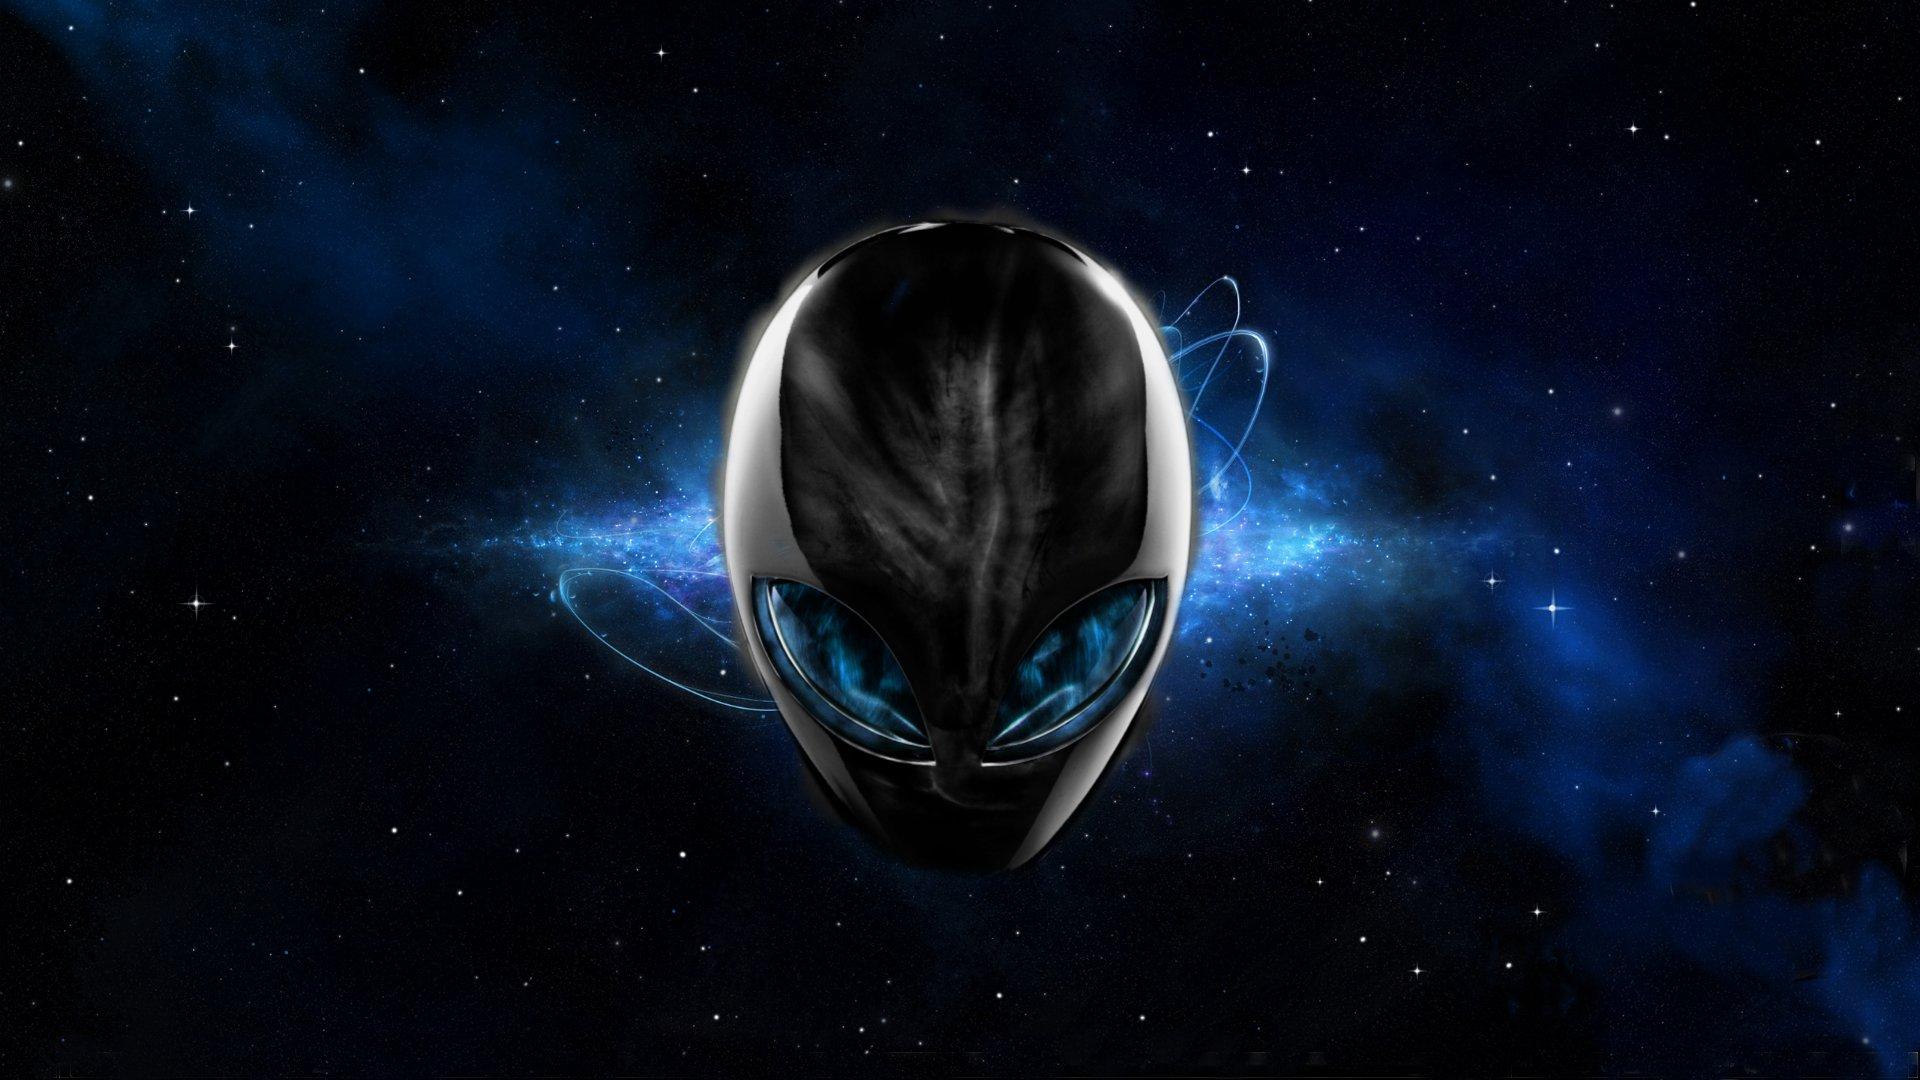 Hd alien backgrounds sex pic